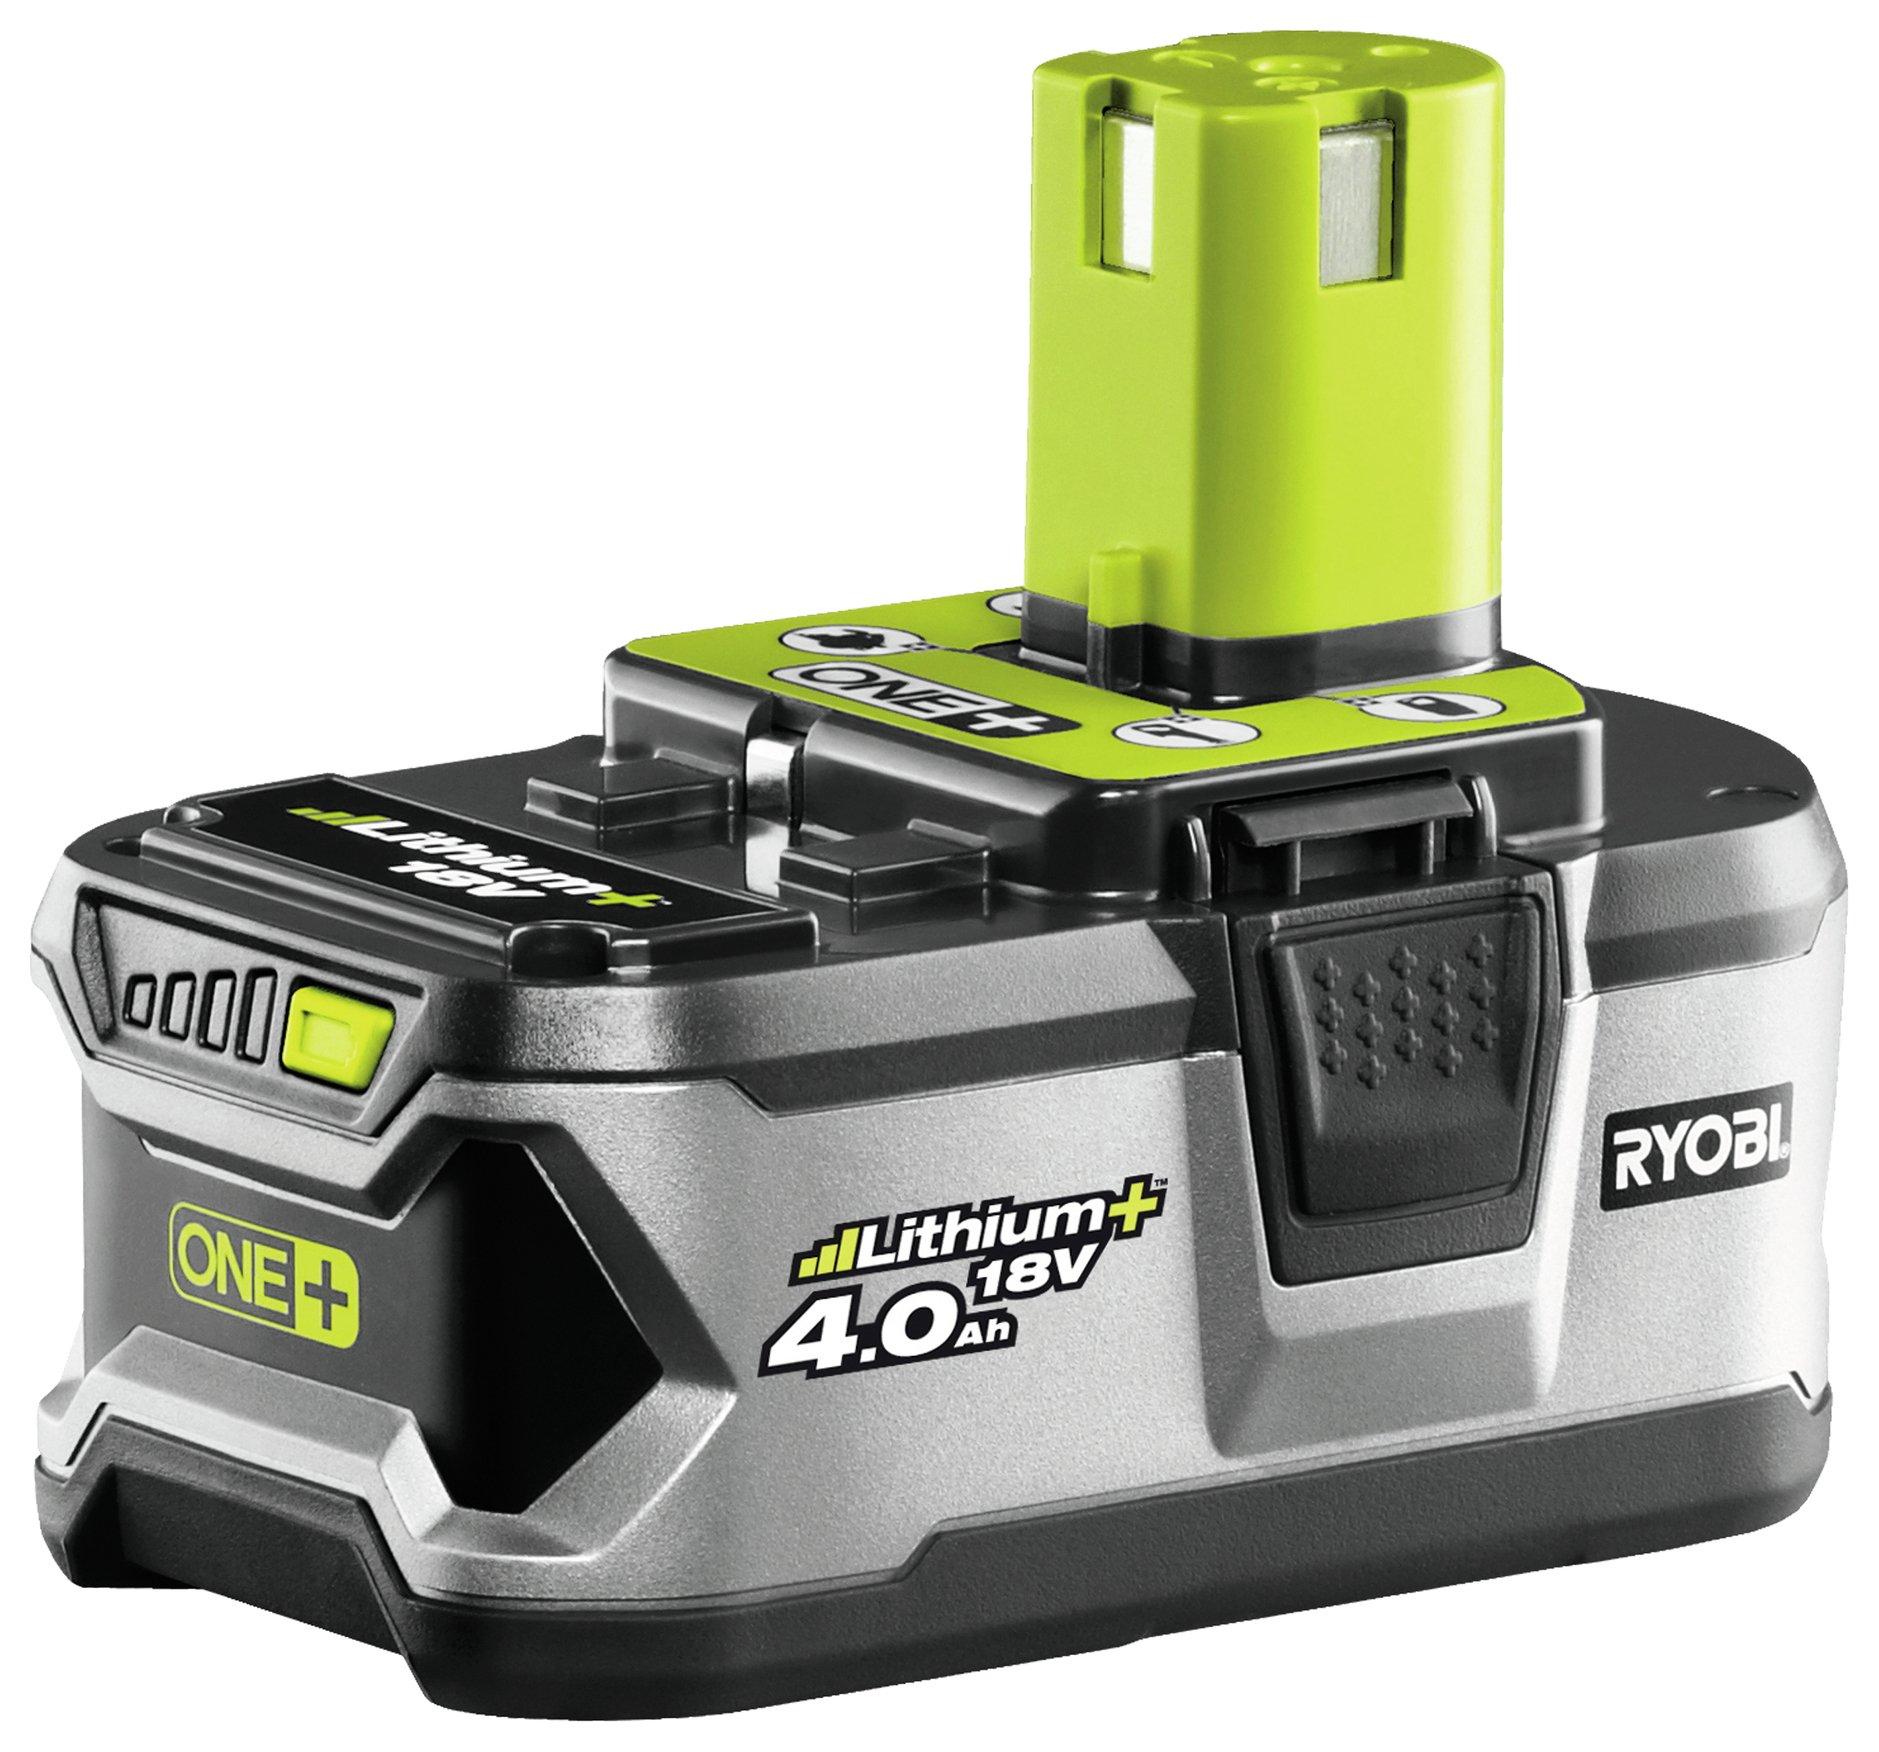 Ryobi - RB18L40 ONE+ 40Ah Battery